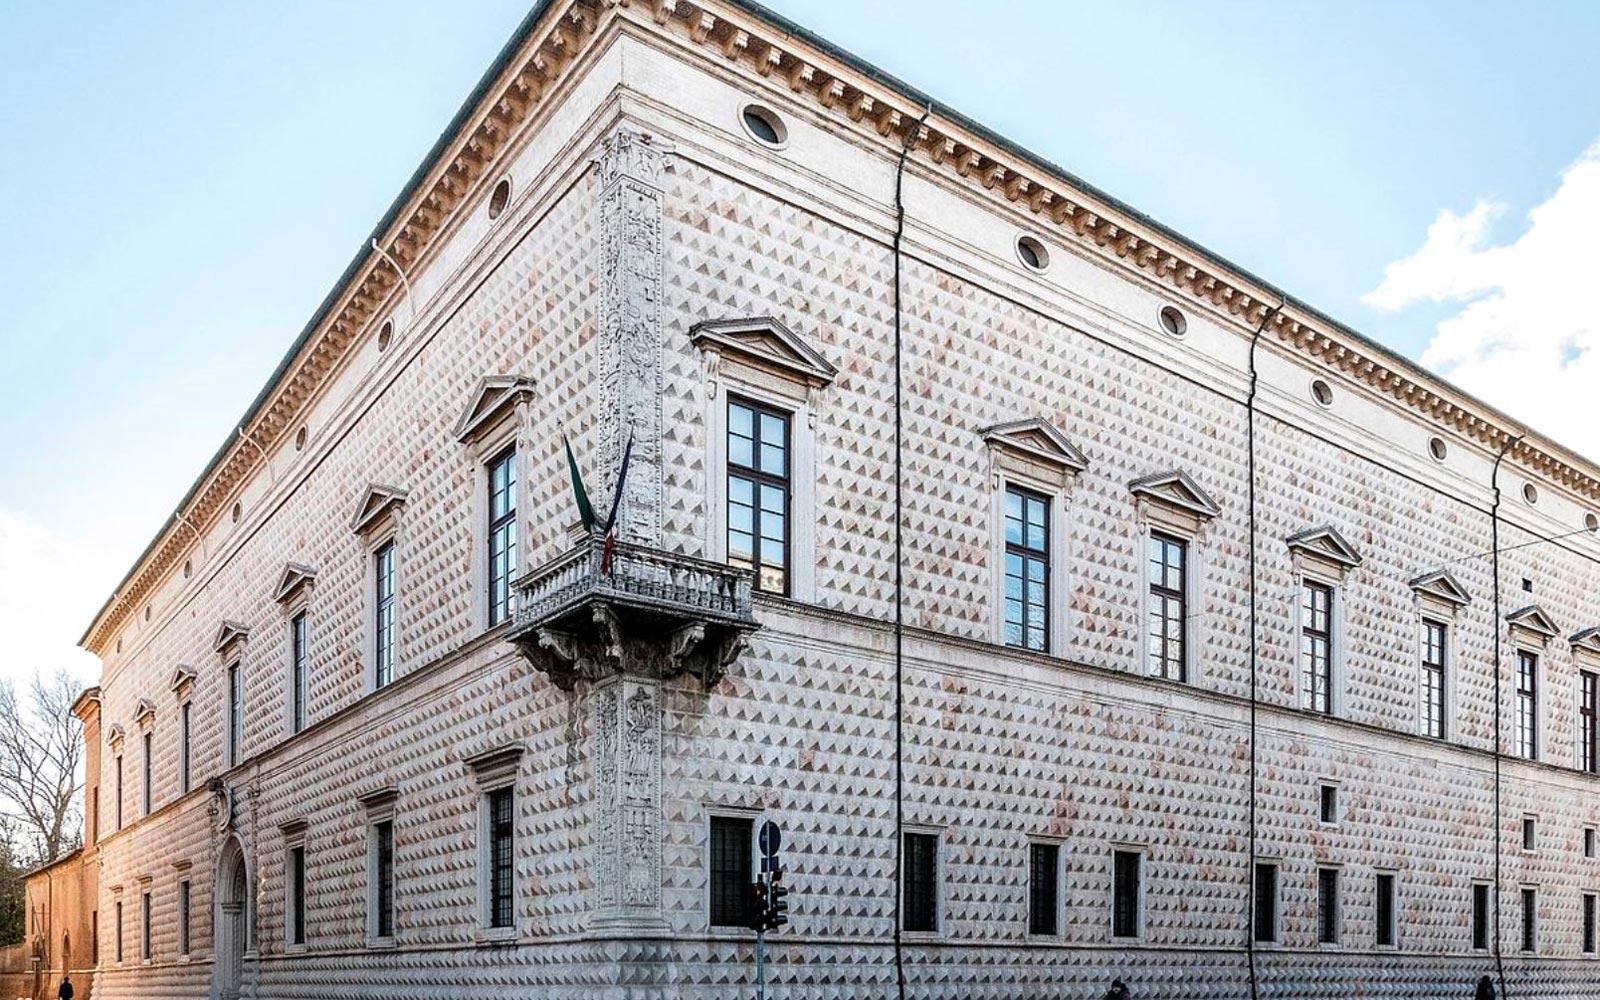 05_Ferrara_Palazzo_dei_Diamanti